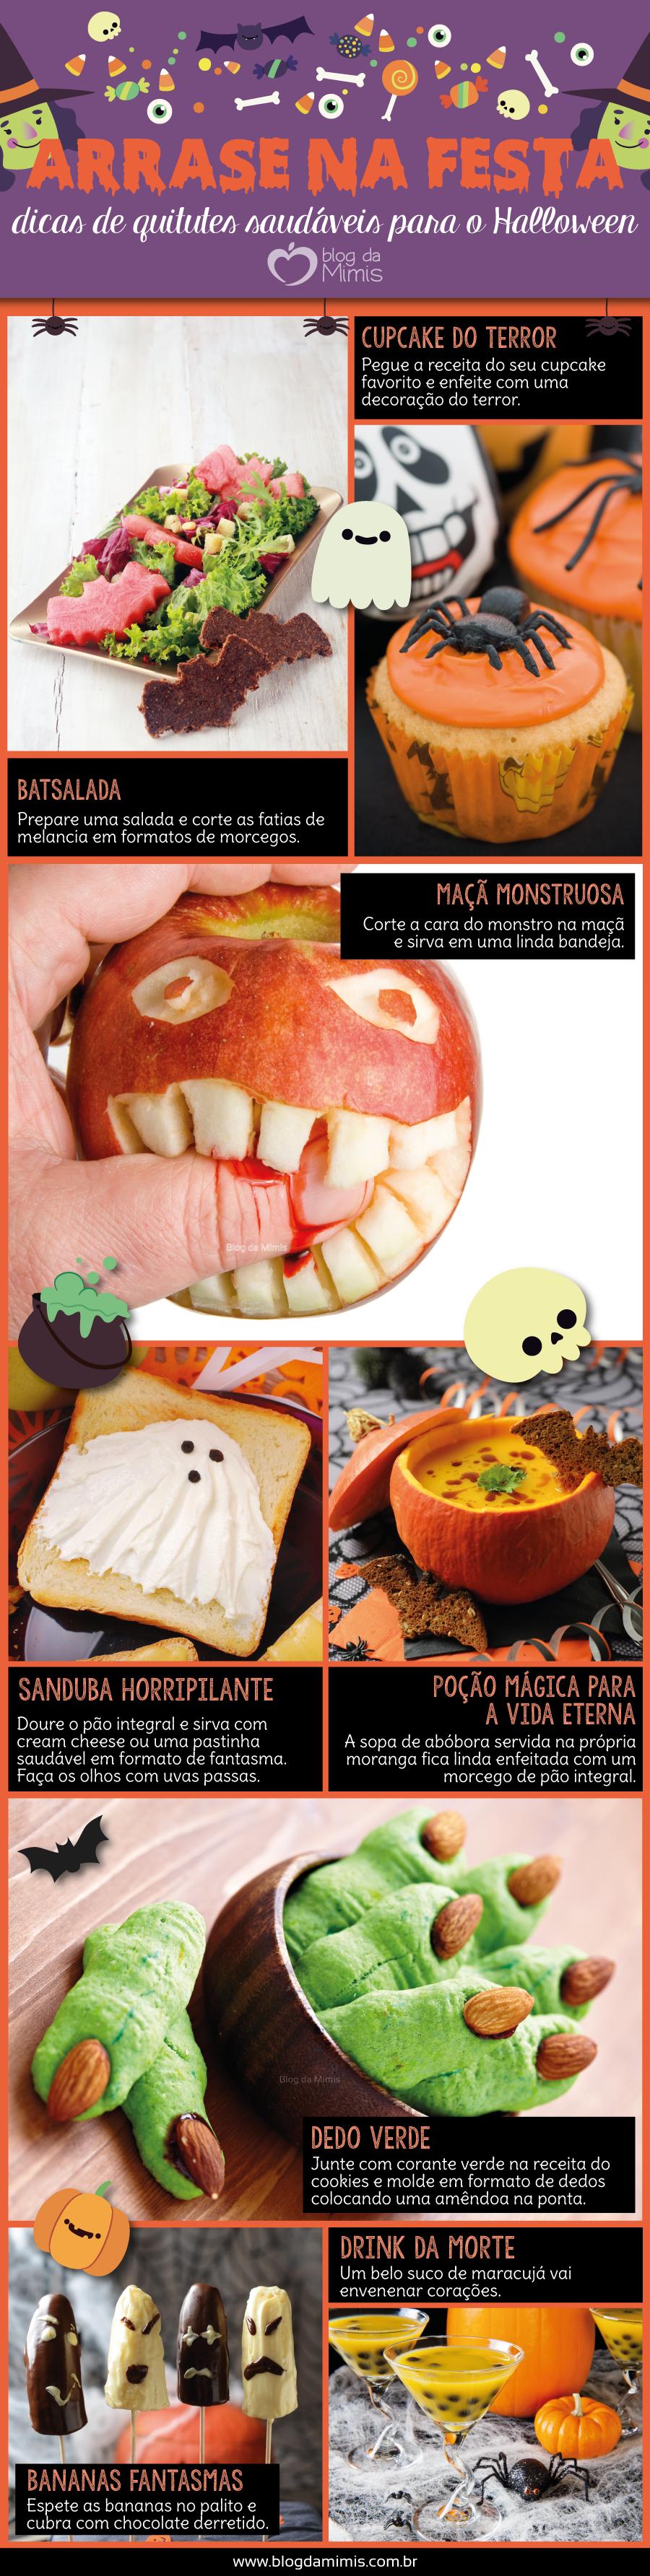 halloween-blog-da-mimis-michelle-franzoni-post